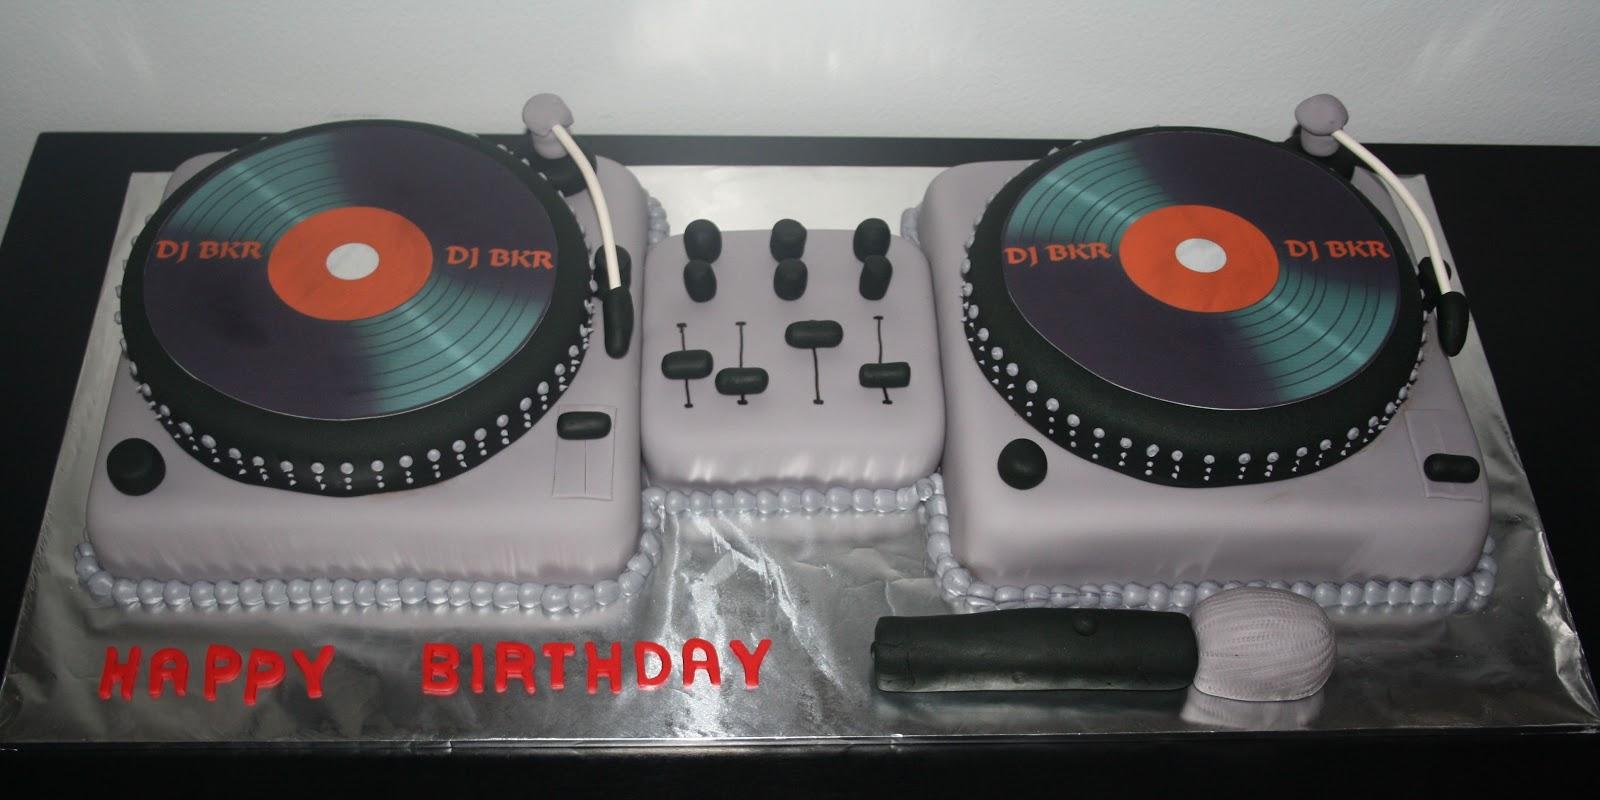 Jacqueline S Sweet Shop Dj Turntable Cake